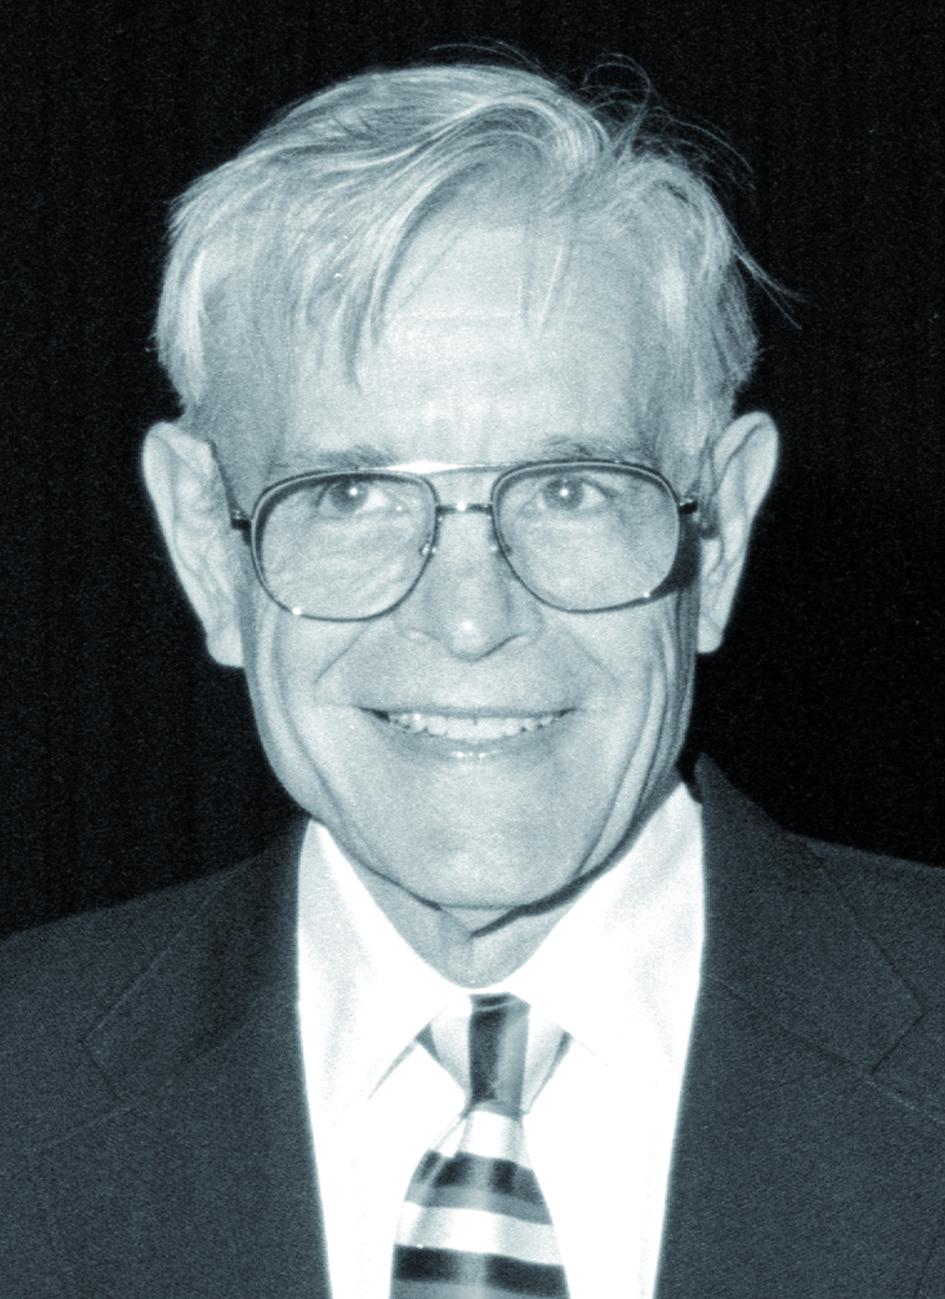 Portraitfoto von Herrn Herman D. Suit.